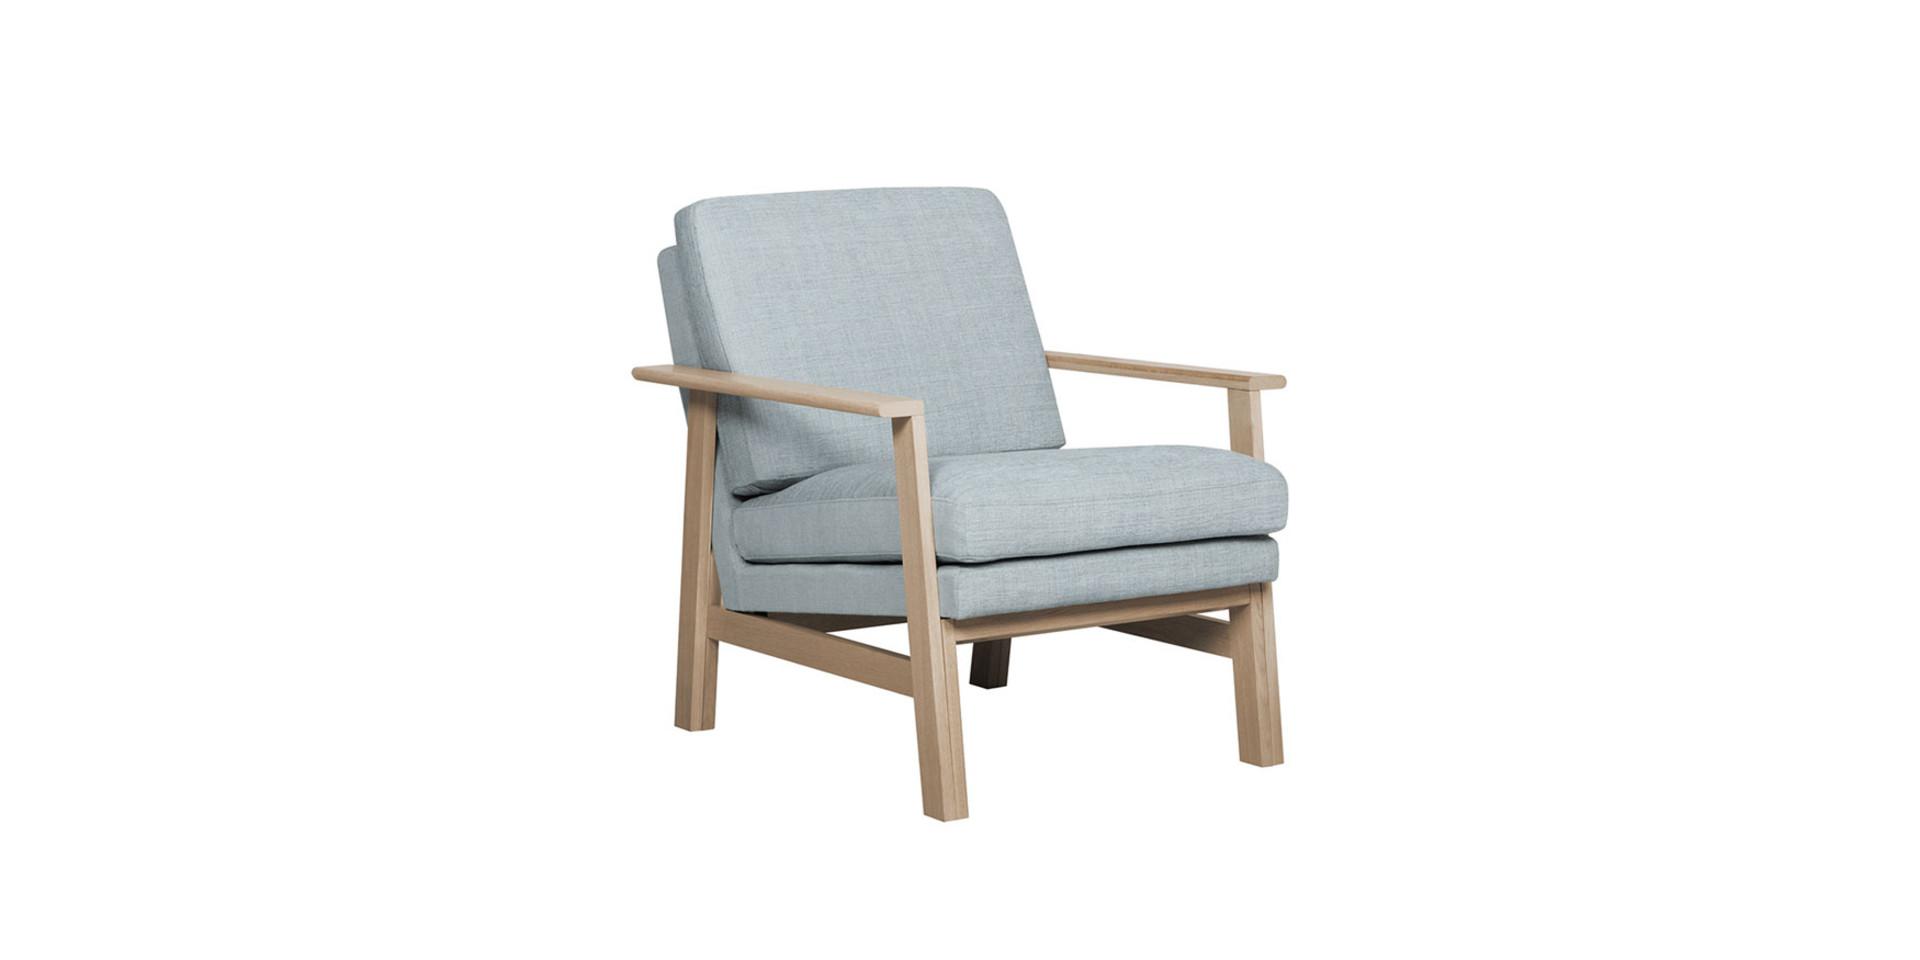 FINE_element55_armrests_wood_mattis49_light_turquoise_2_0